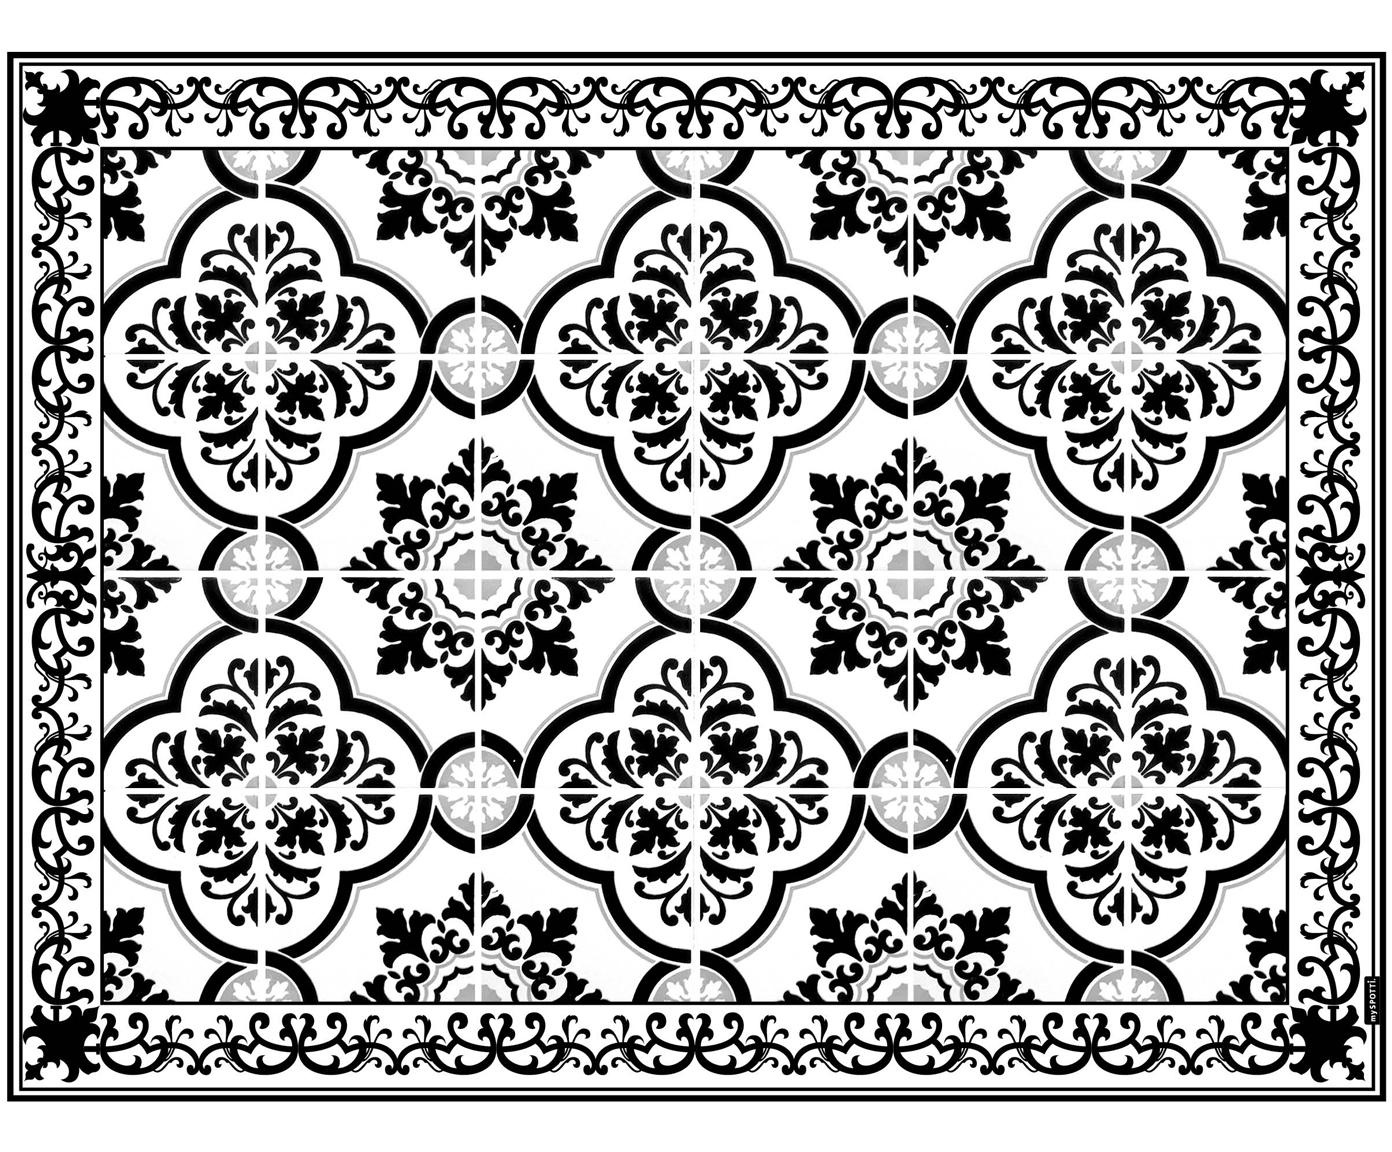 Alfombra vinílica Elena, Vinilo, reciclable, Negro, blanco, gris, An 65 x L 85 cm